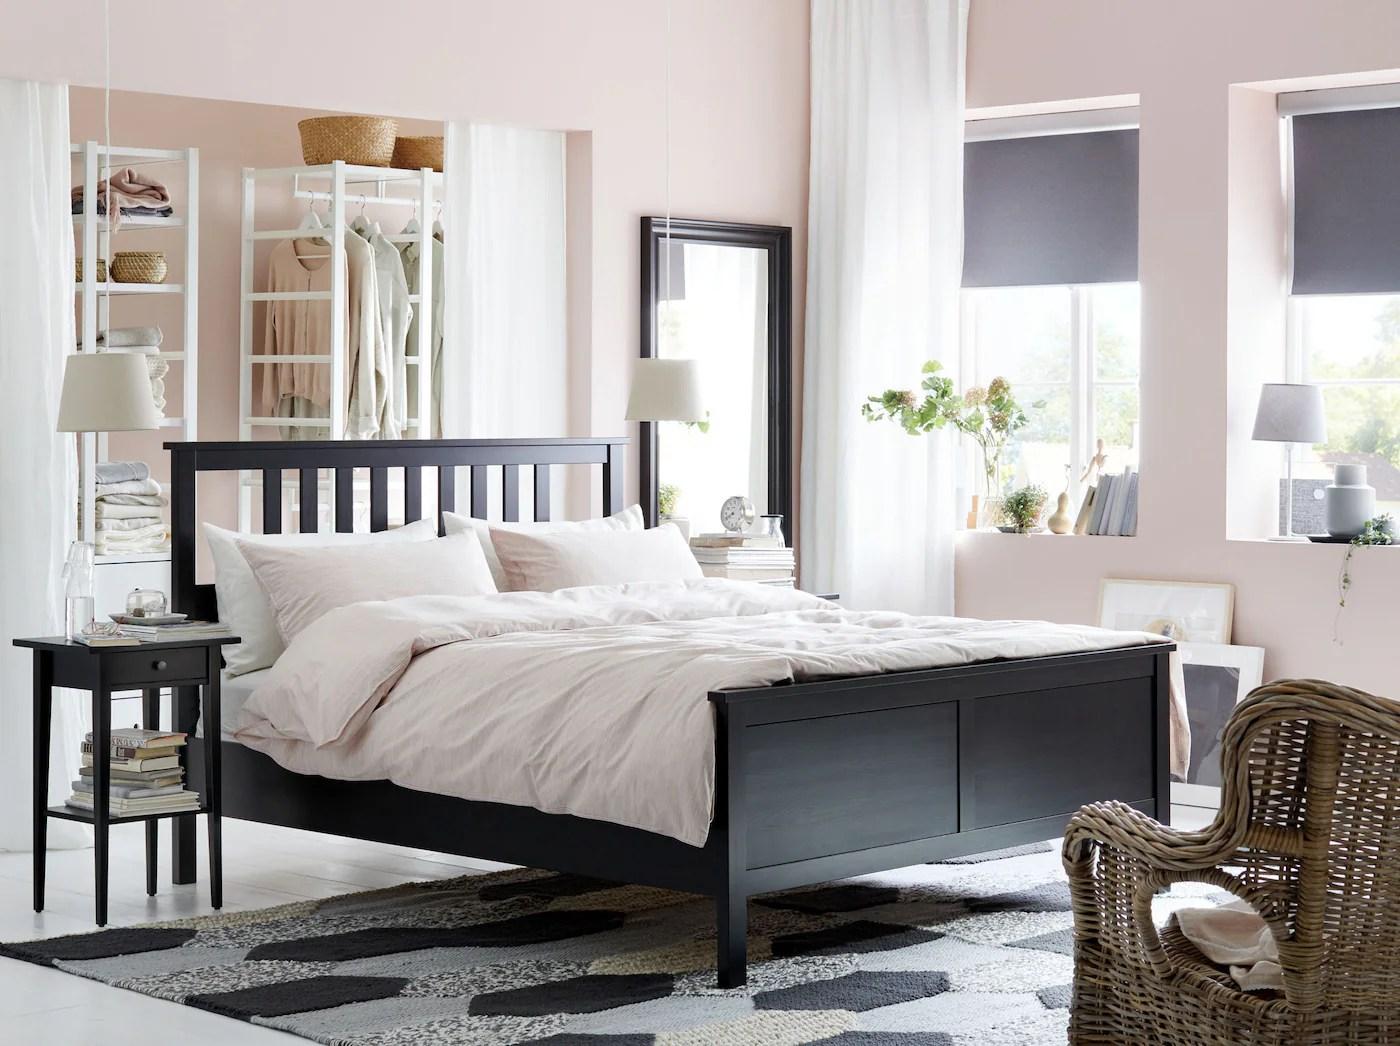 Une Chambre A Coucher Stylee Sous Tous Les Angles Ikea